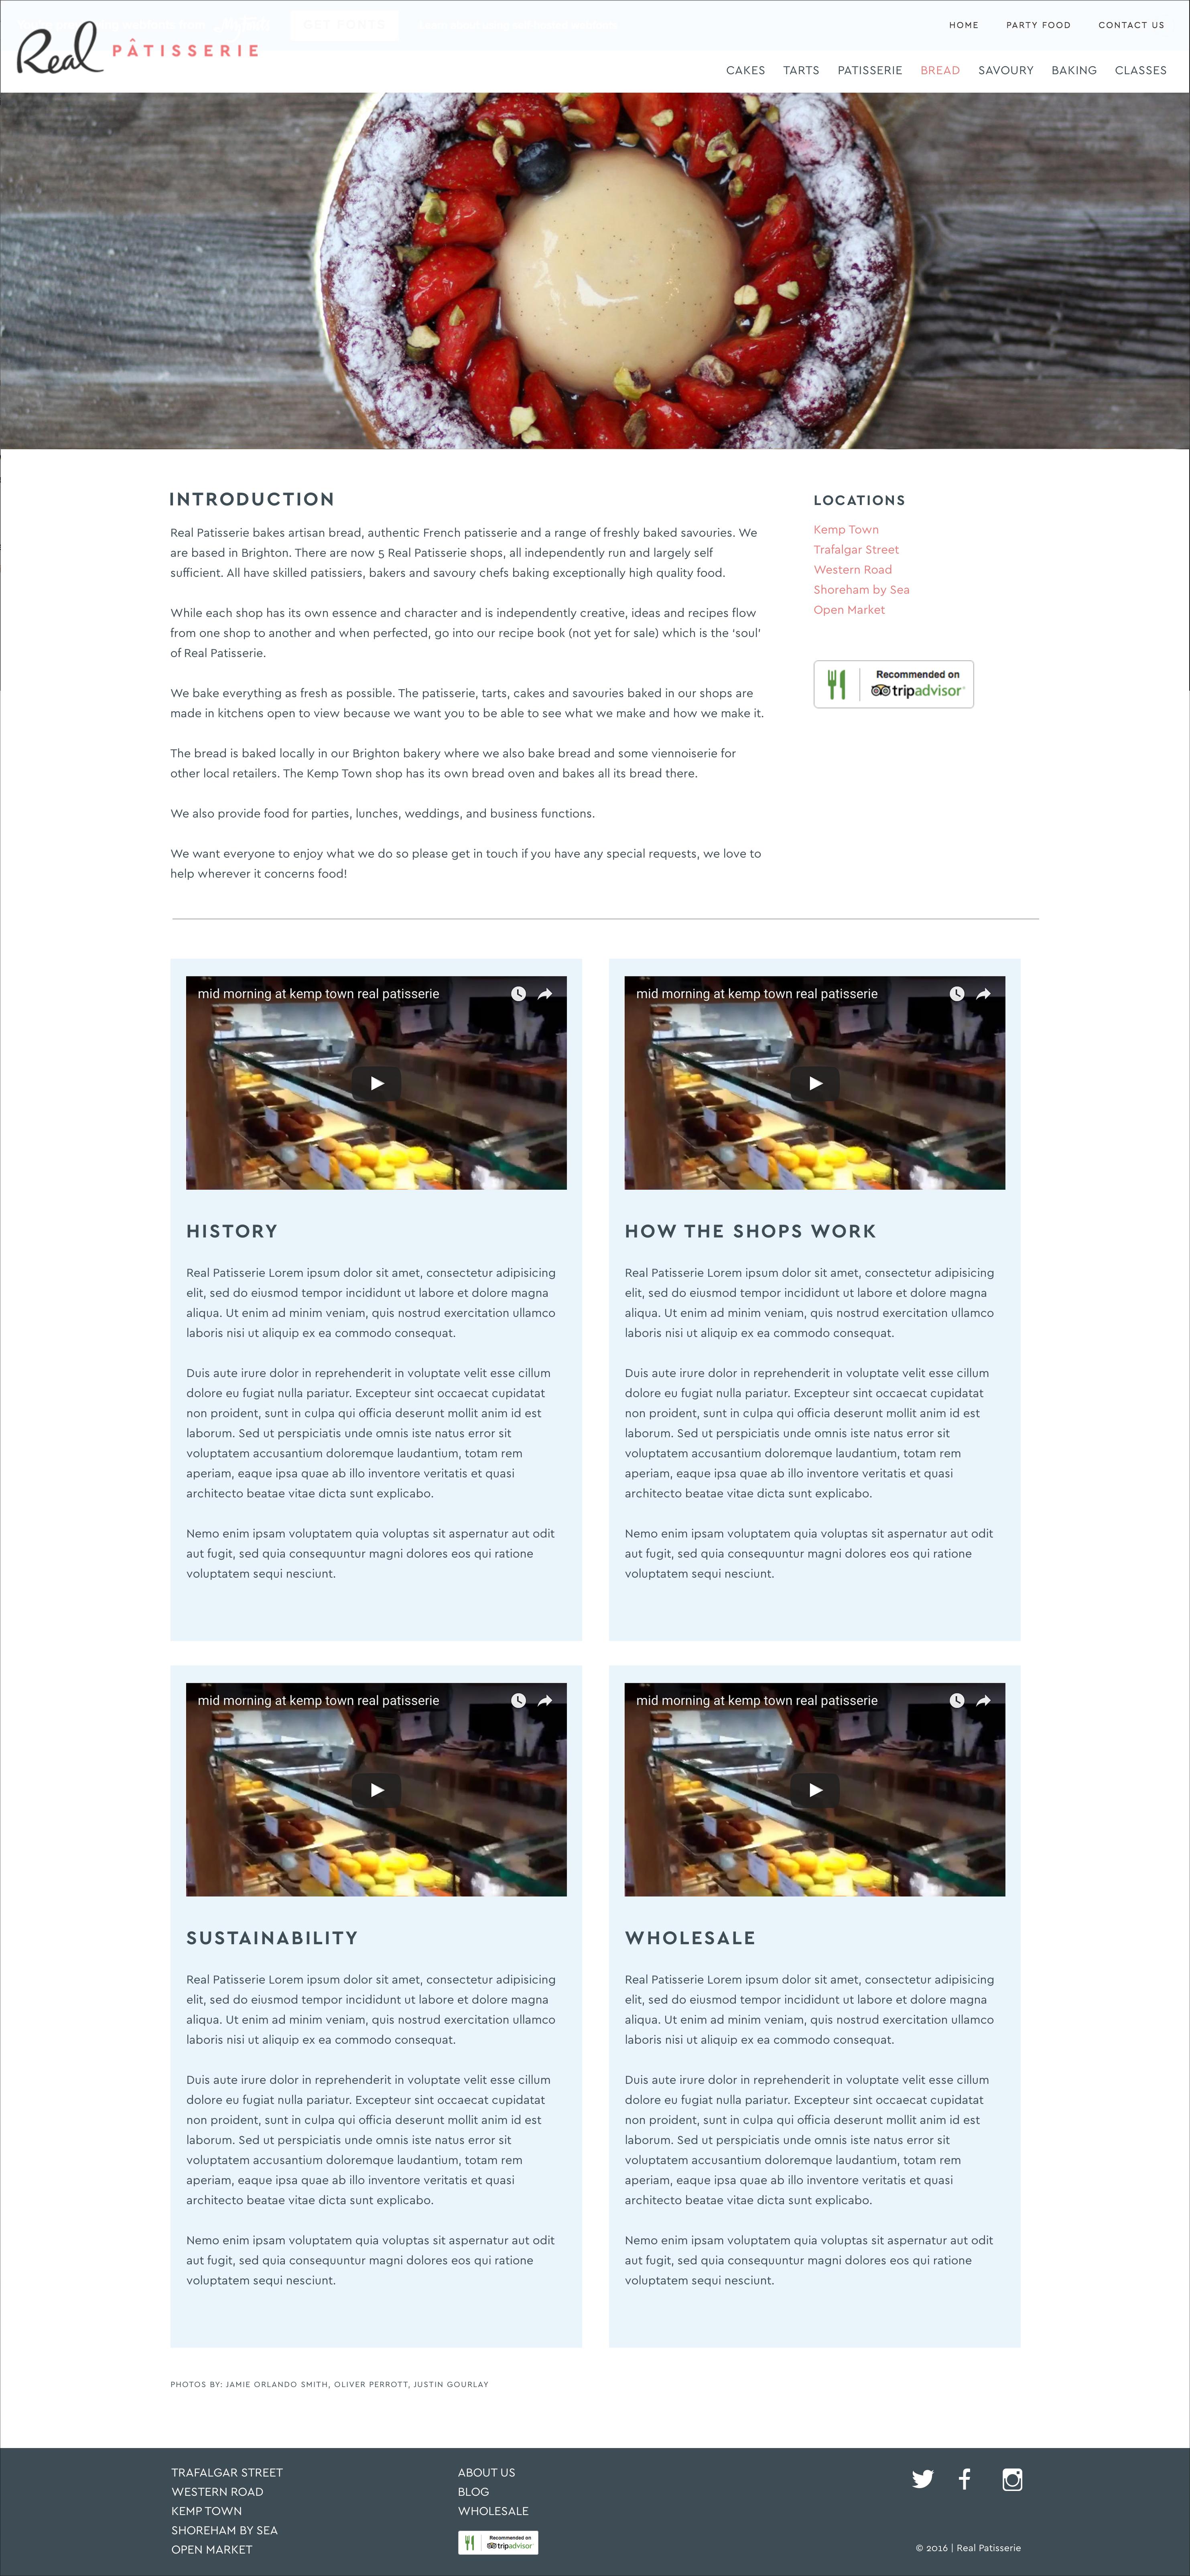 Website design for Real Patisserie